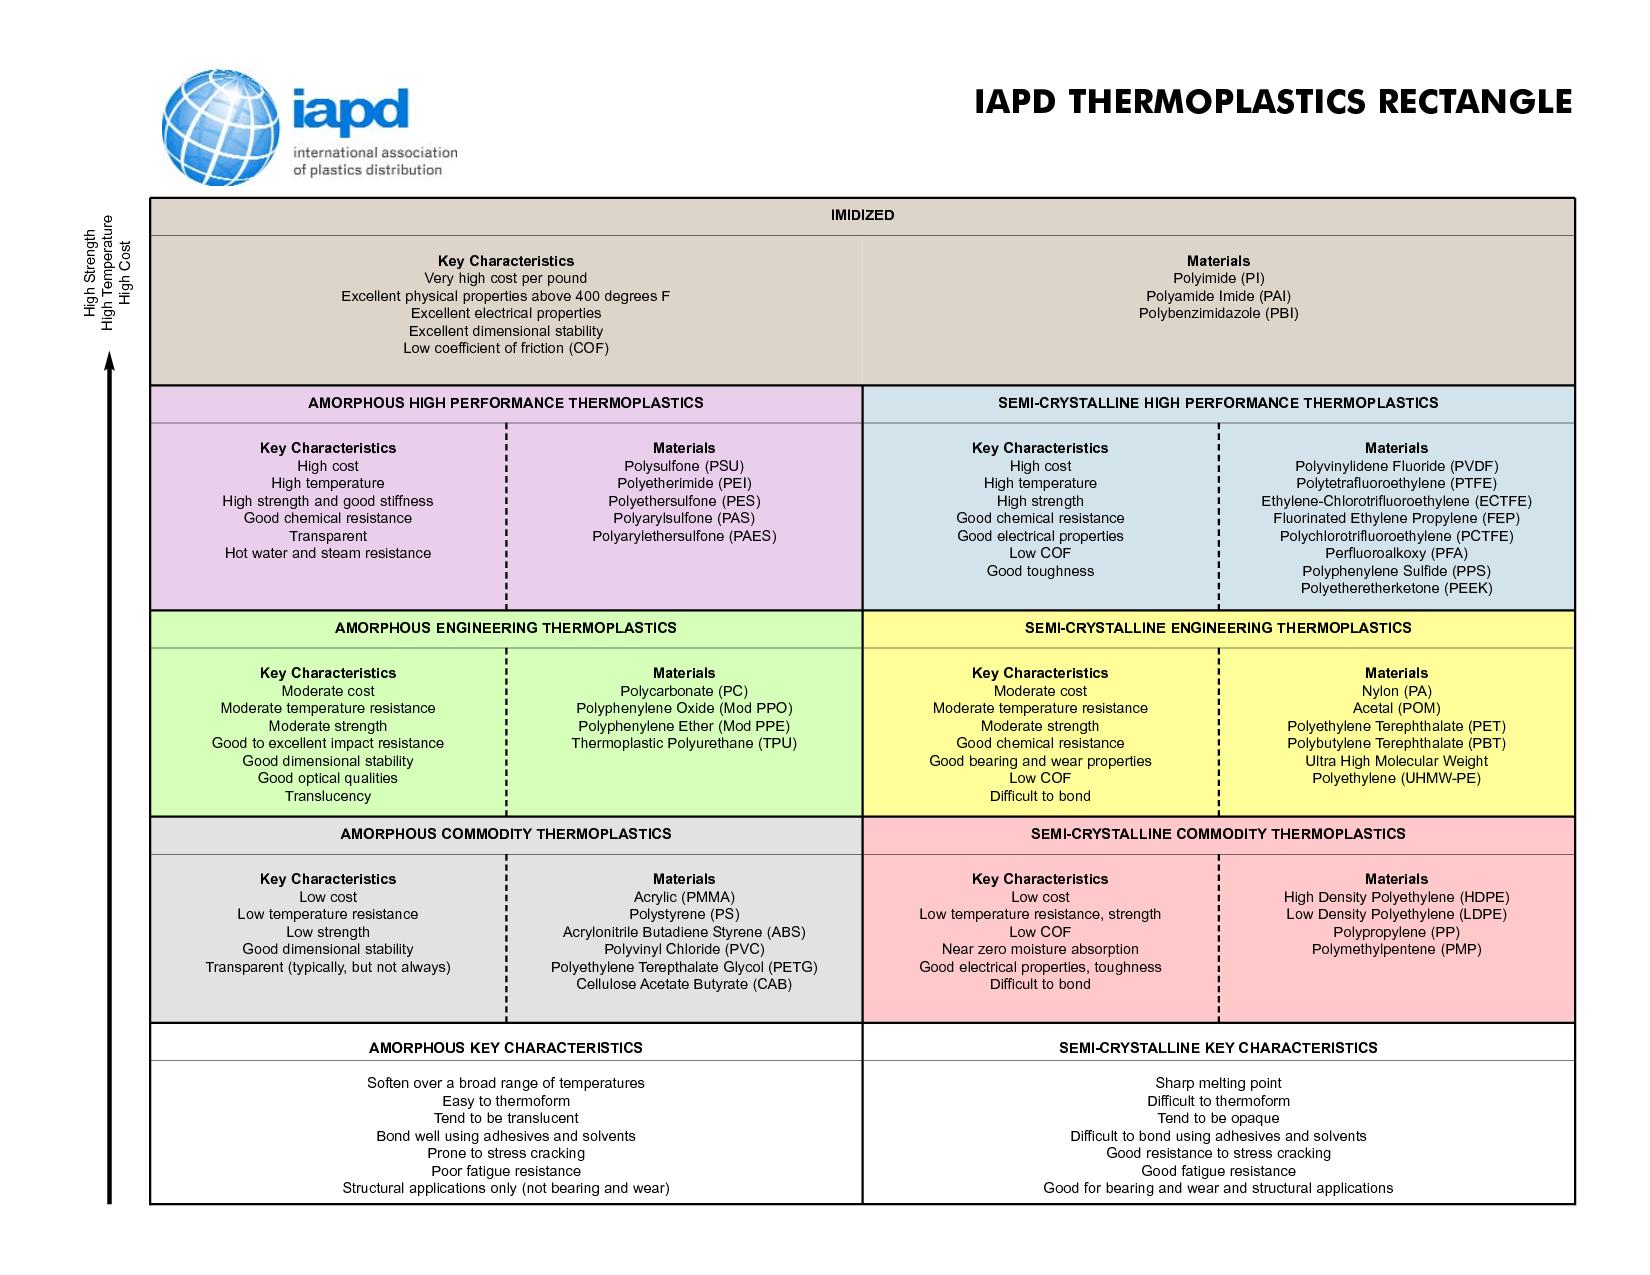 iapd_thermoplastics_rectangle